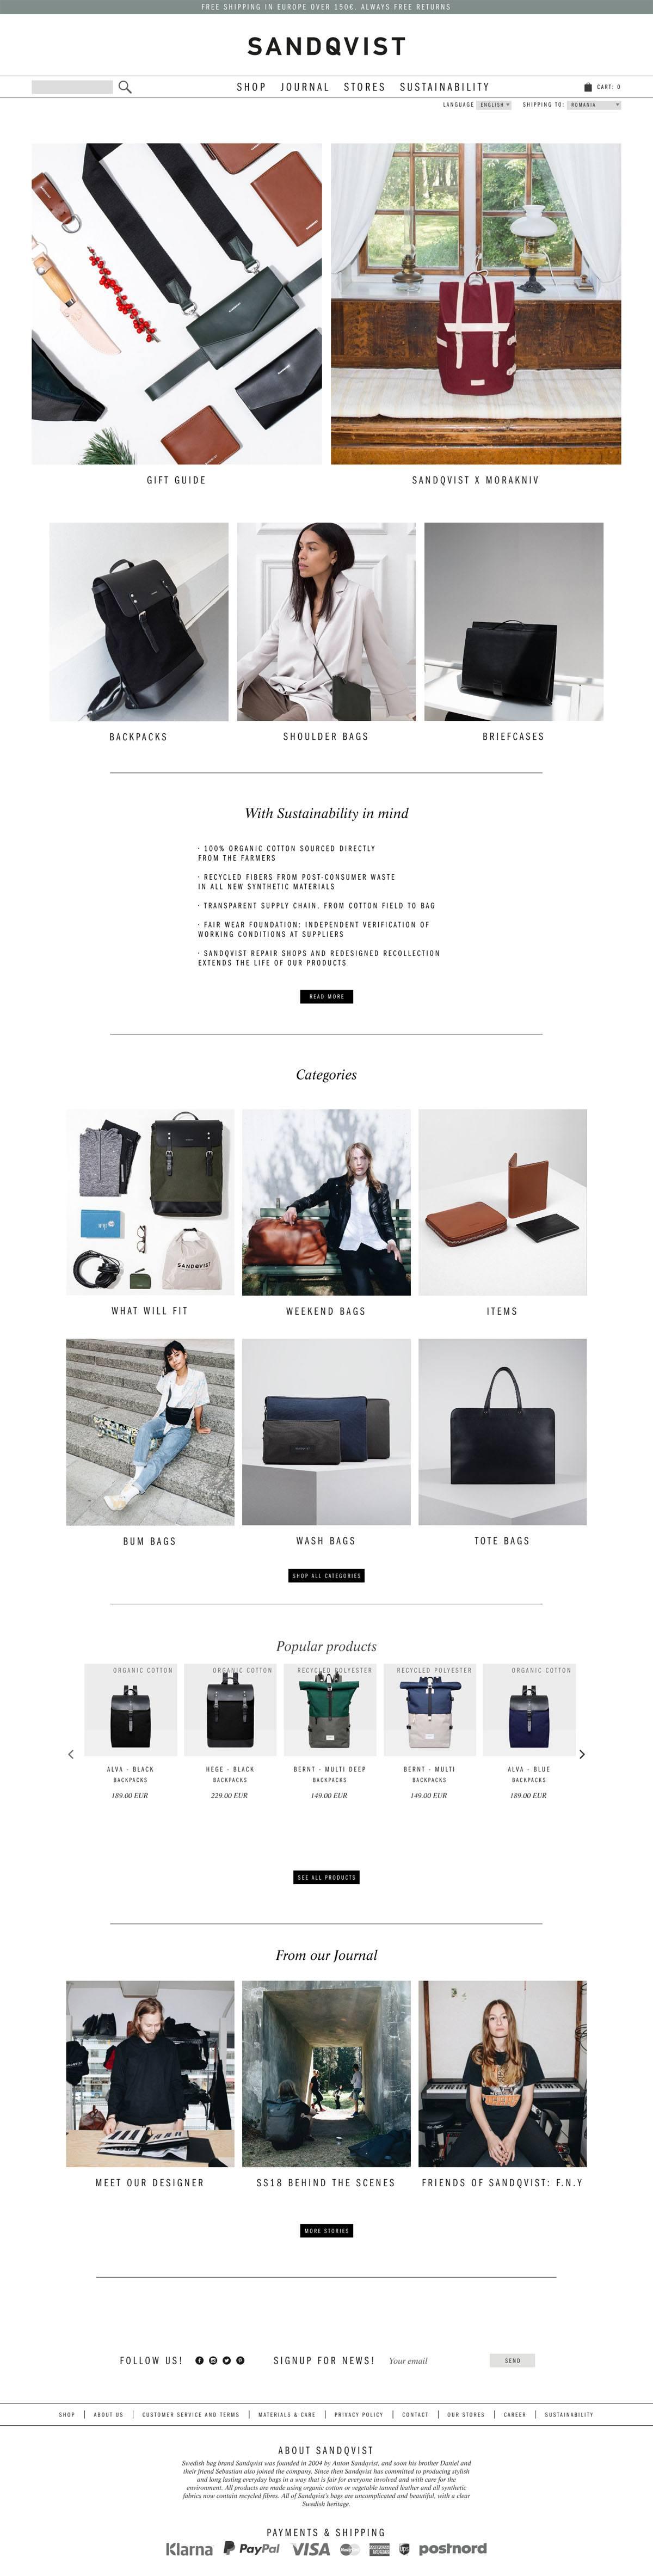 eCommerce website: Sandqvist